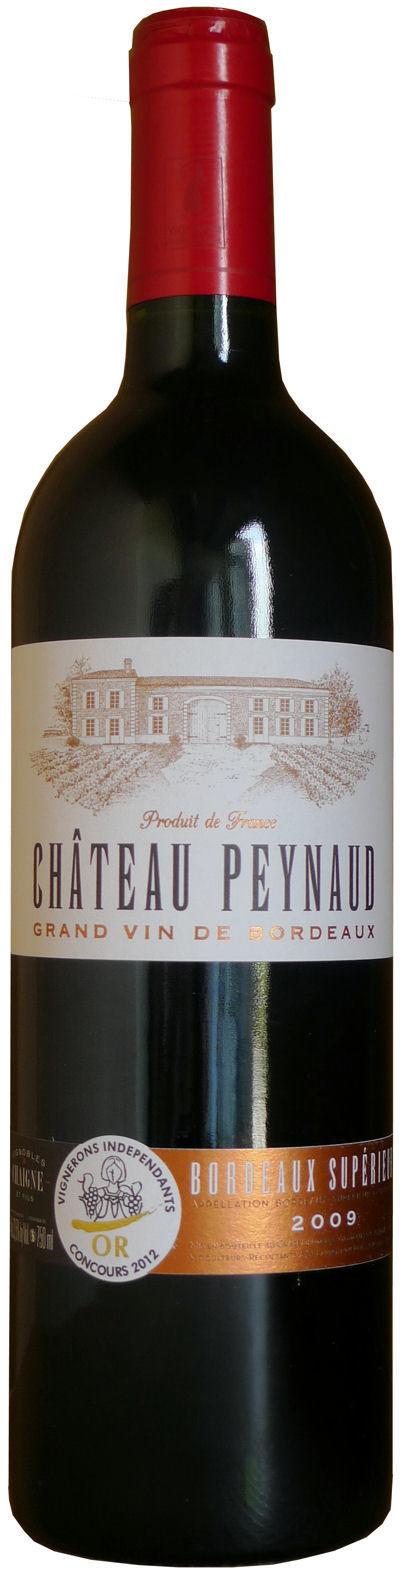 Château Peynaud sera commercialisé cet automne en Ontario | Nombrilisme | Scoop.it